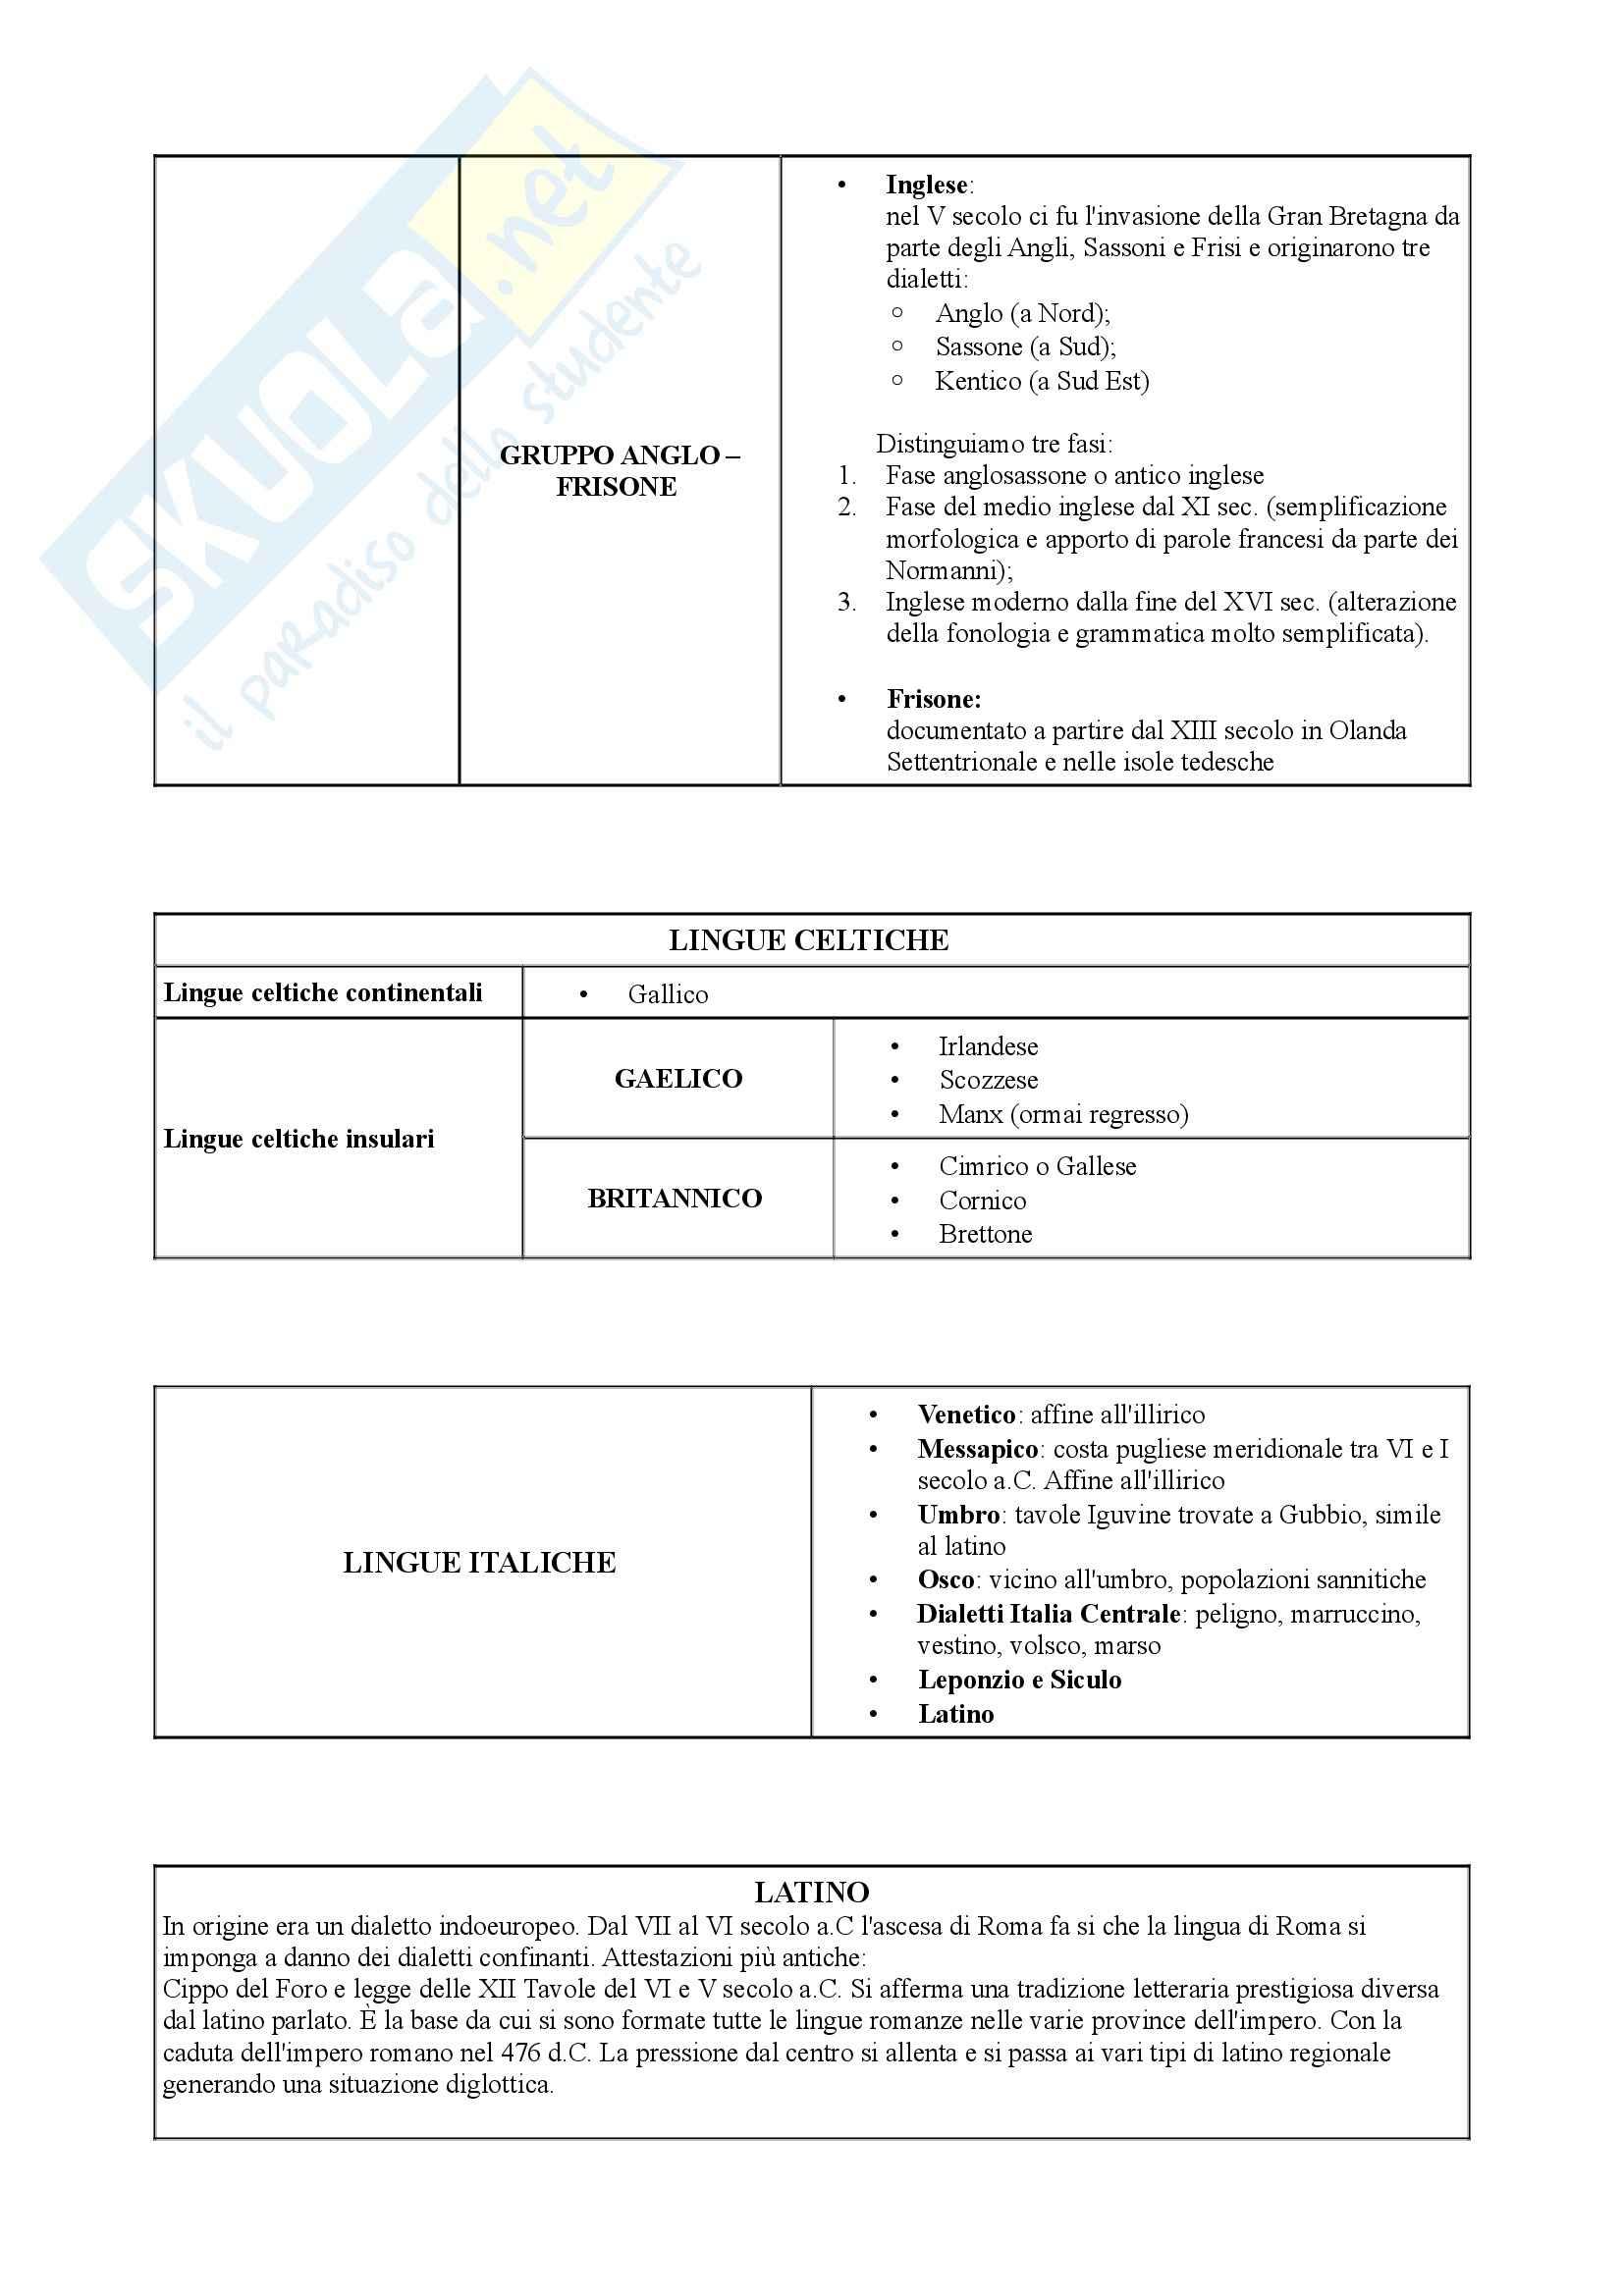 Glottologia - Appunti Pag. 6